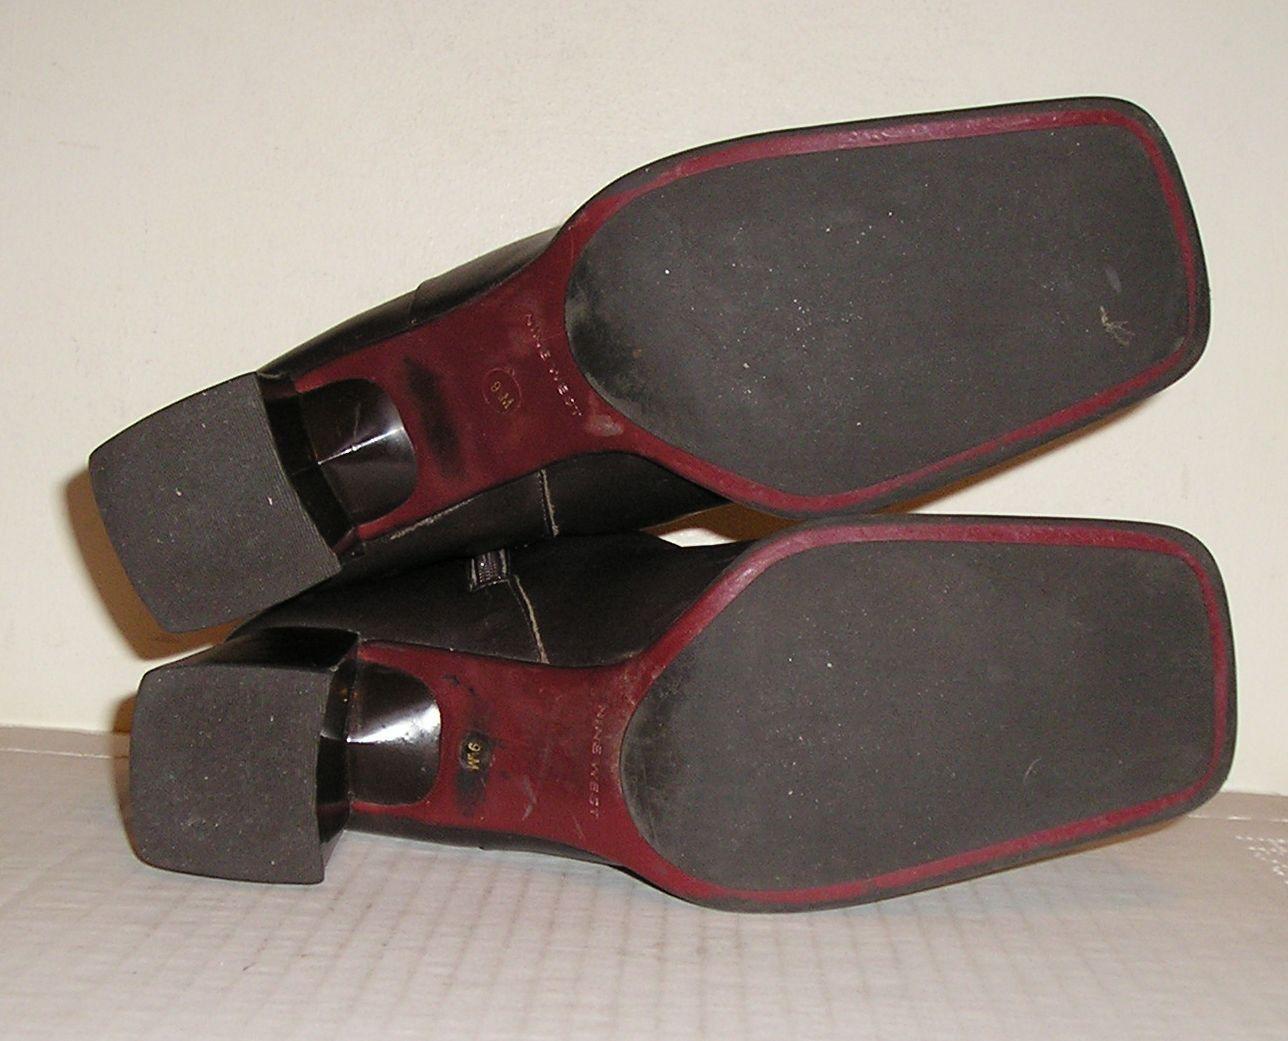 NINE WEST ZAMIR Women's Dark Brown Leather Dress Fashion Ankle Boots Shoes 9.5 M